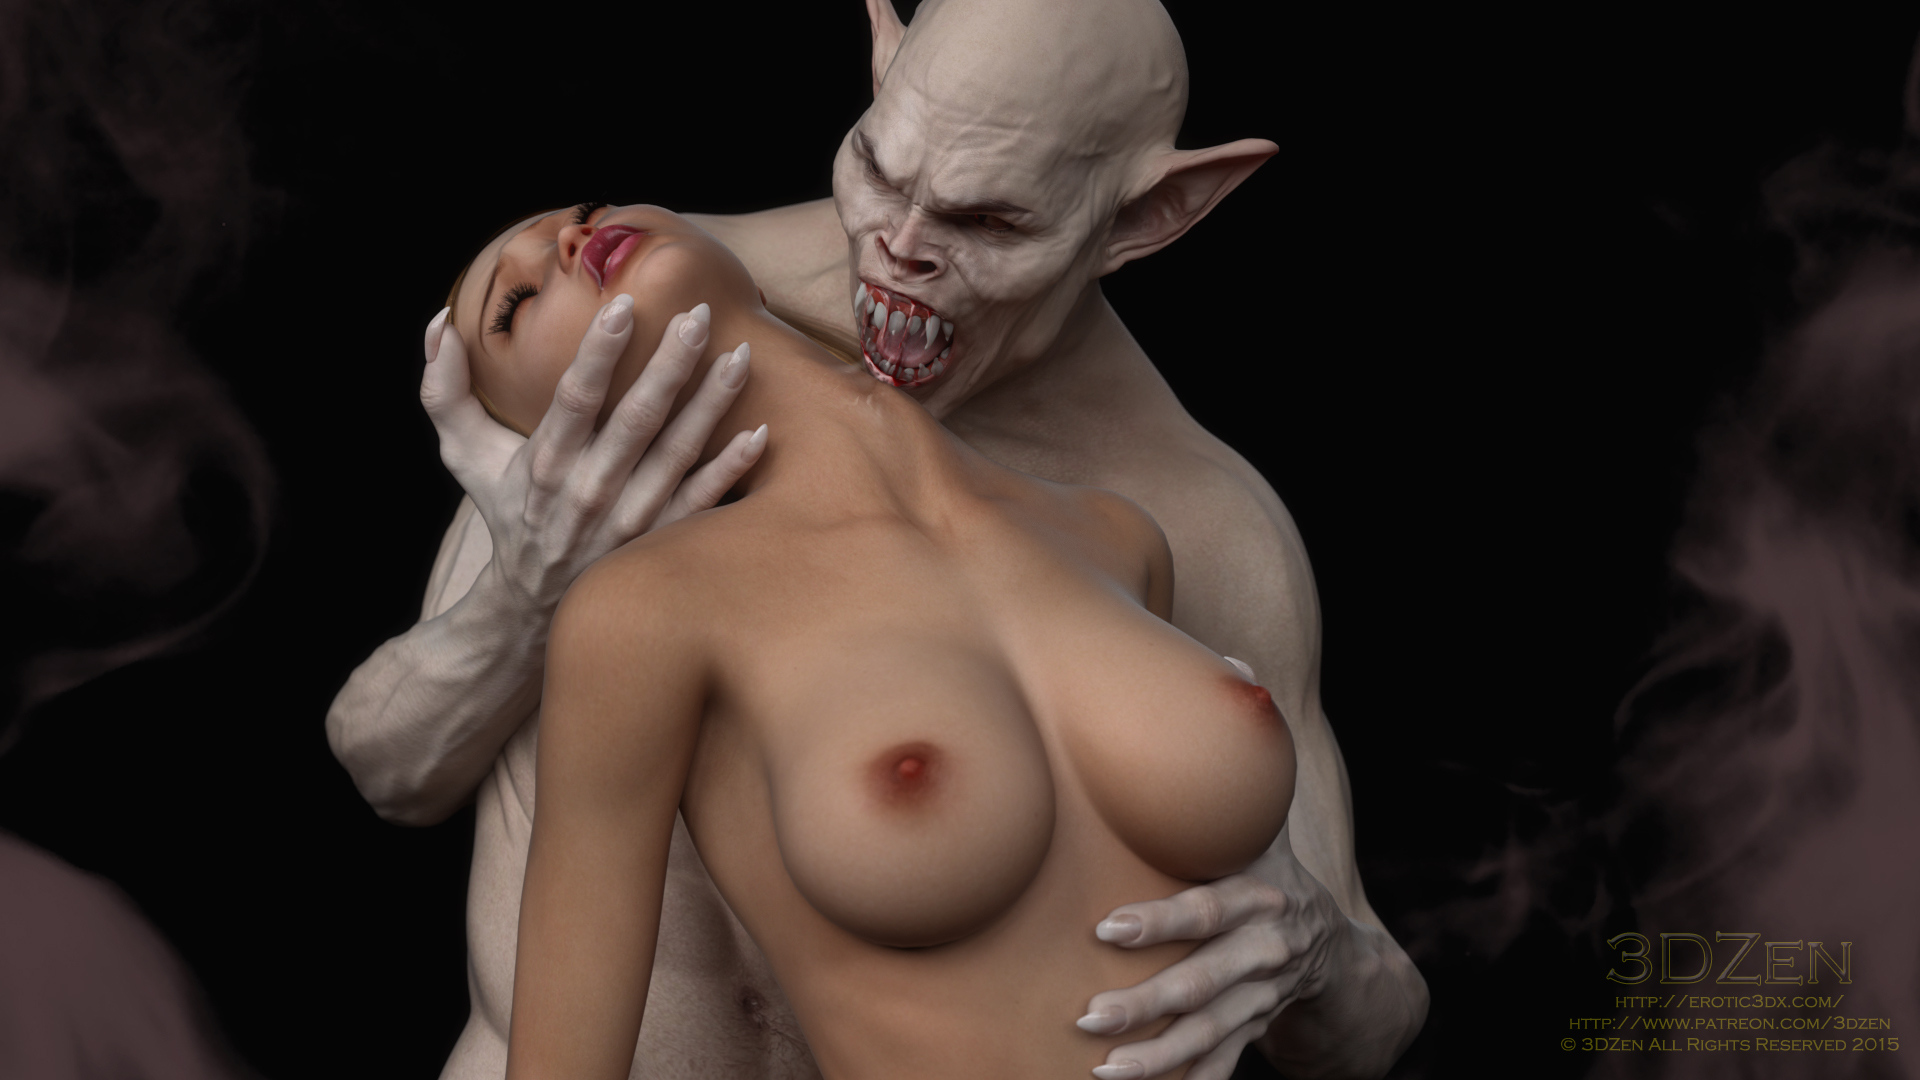 Vampire women porn